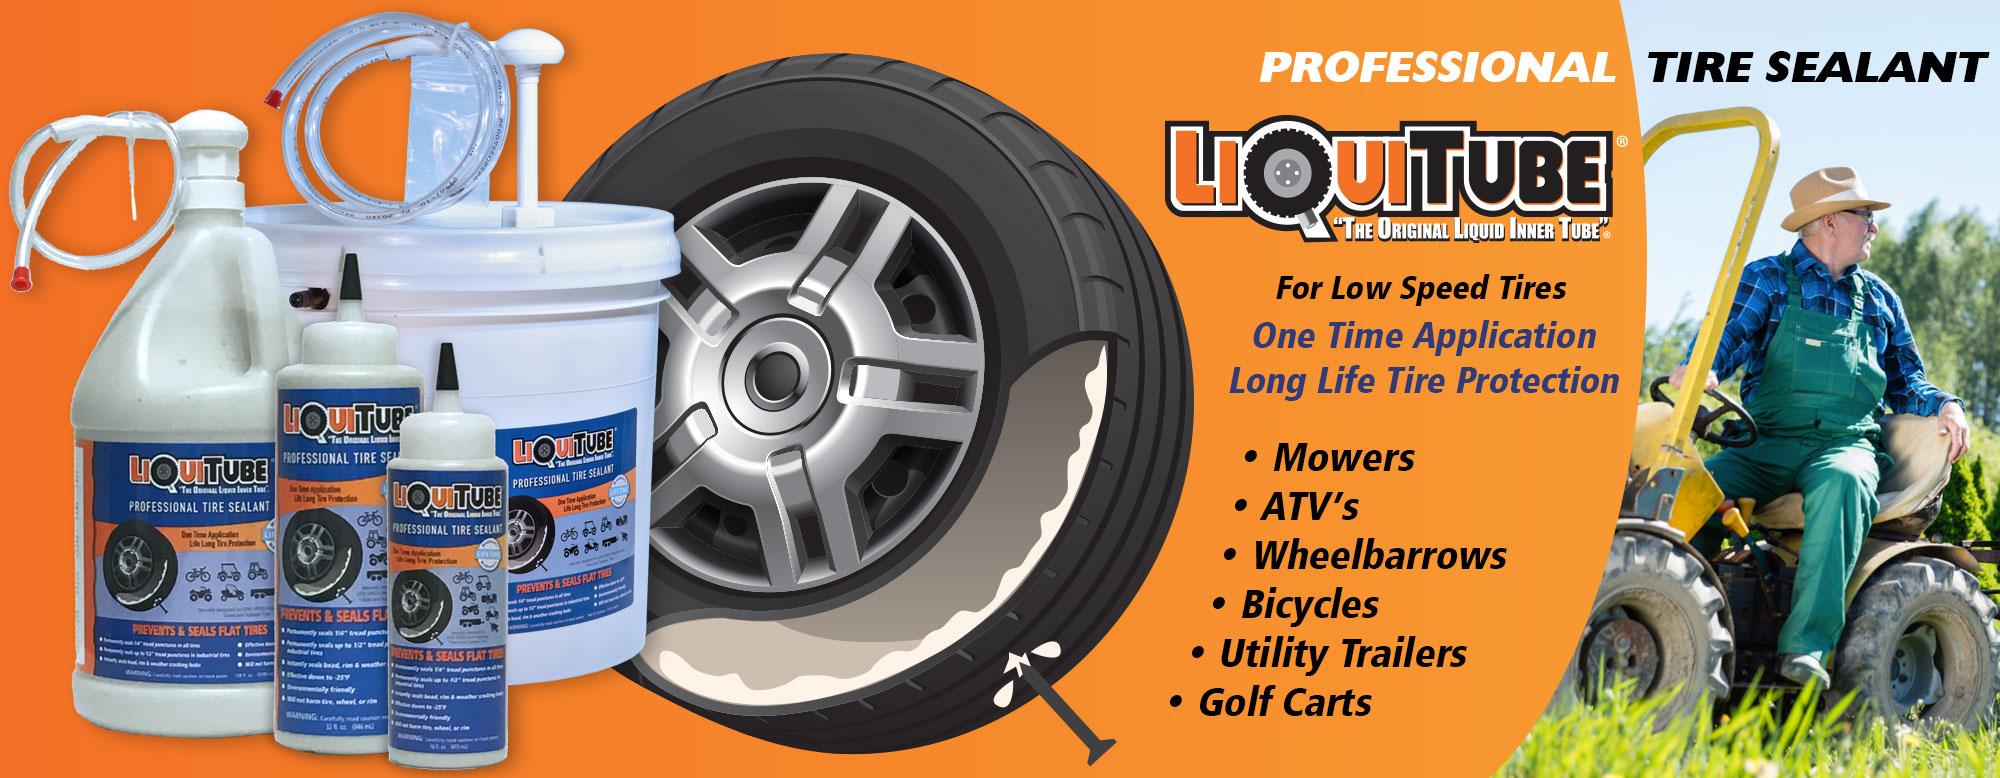 LiquiTube Tire Sealant